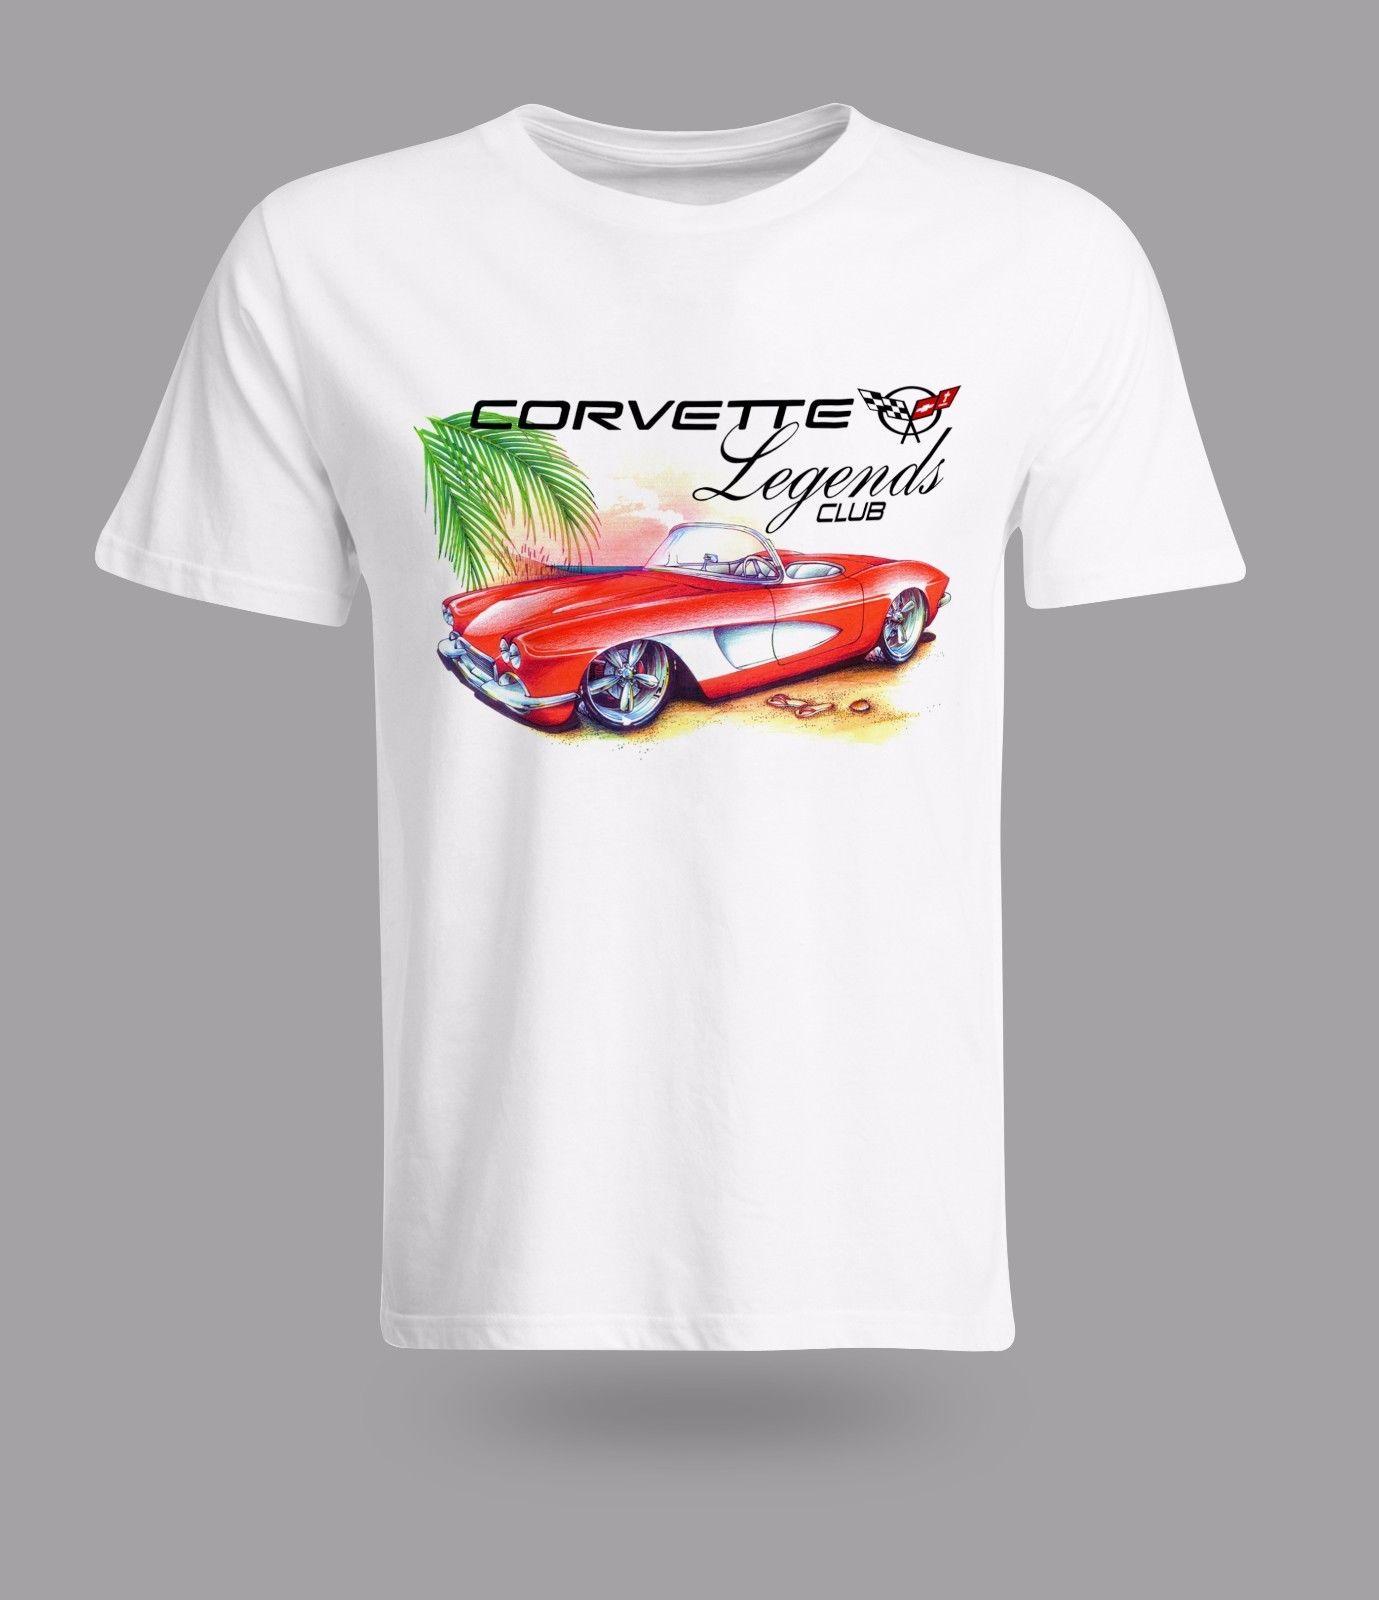 Vintage coche americano Chevrolet Corvette Roadster leyenda hombres camiseta impresa